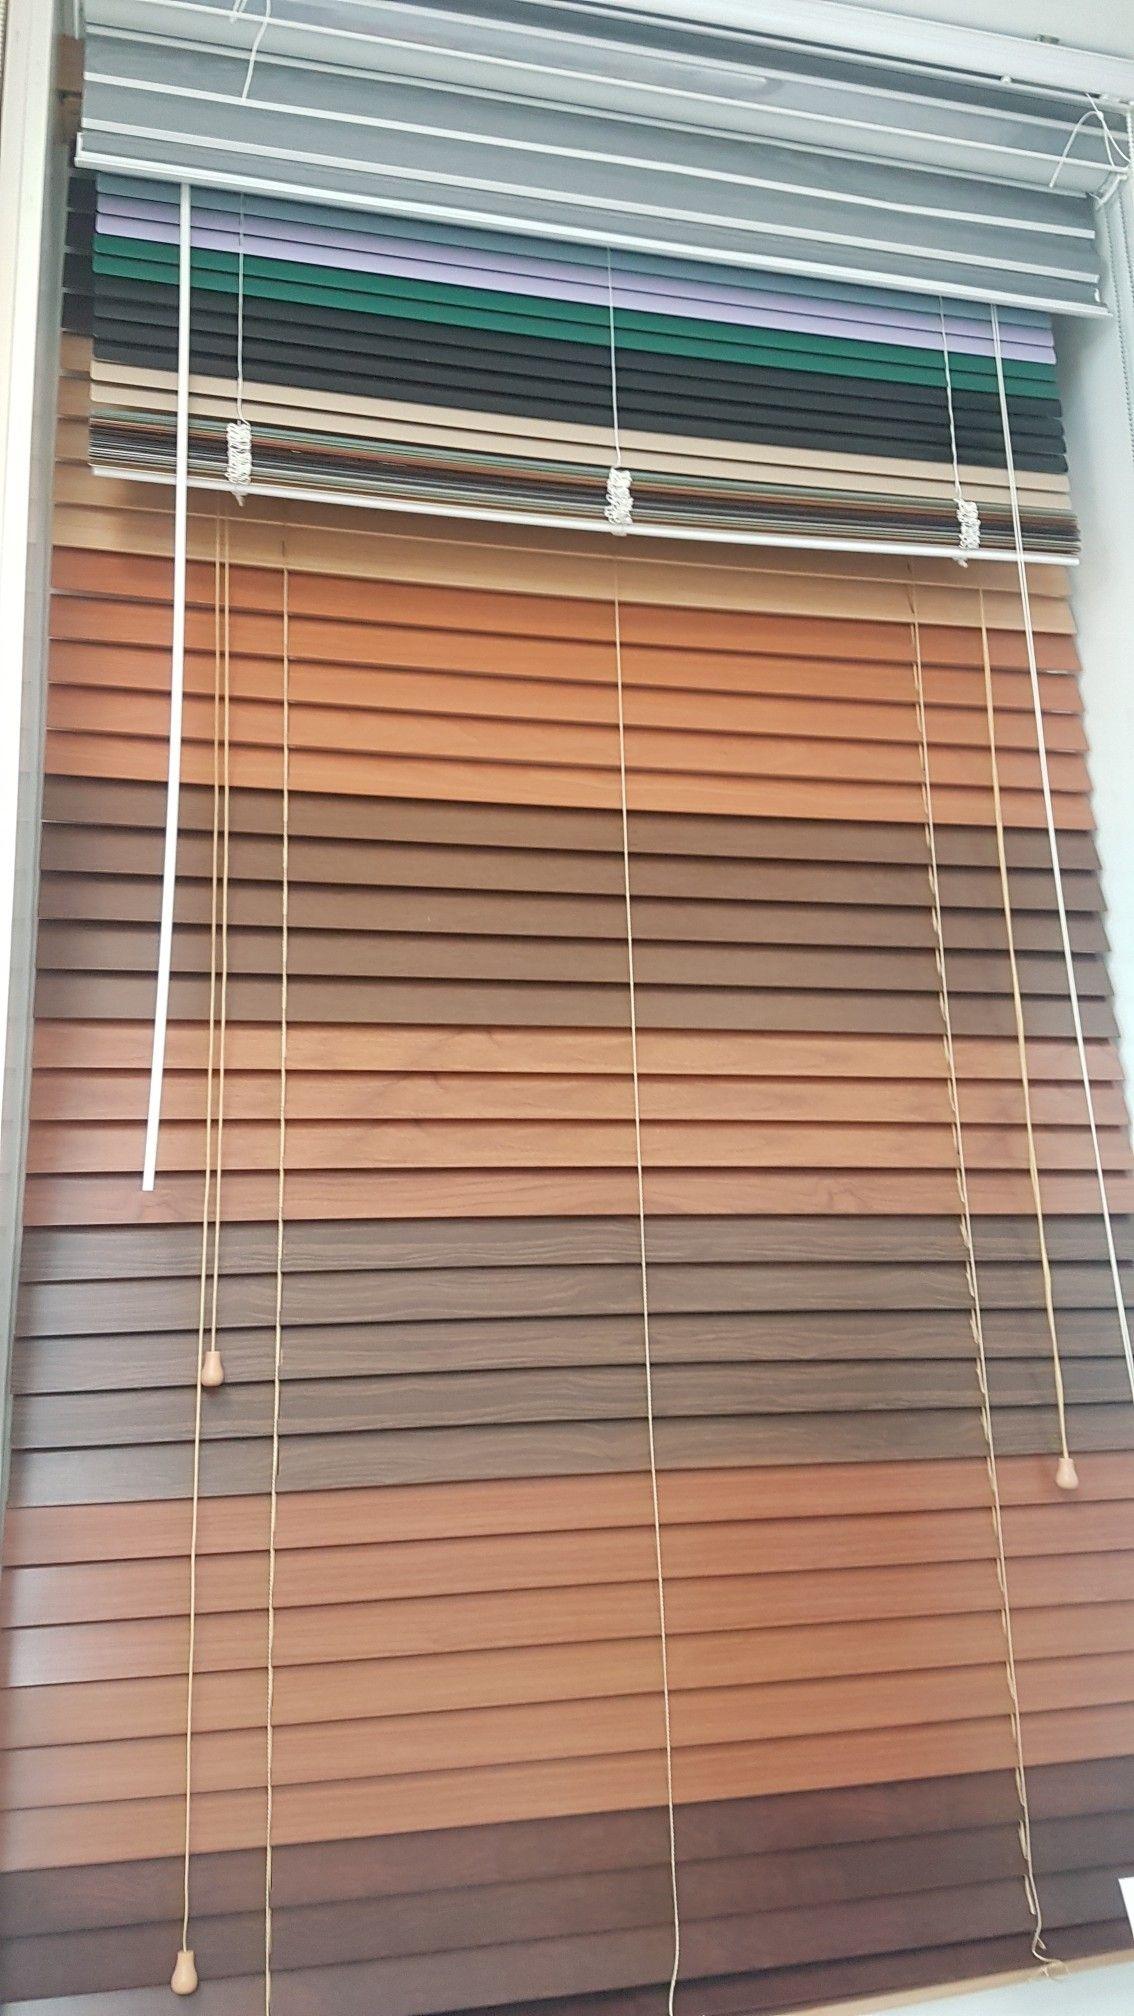 Curtains برادي داخلية ستائر تنفيذ تركيب برادي للاستفسار او واتس اب 0096171170181 Curtains And Other Salon Home Designs Ideas كافة Blinds House Blinds Curtains